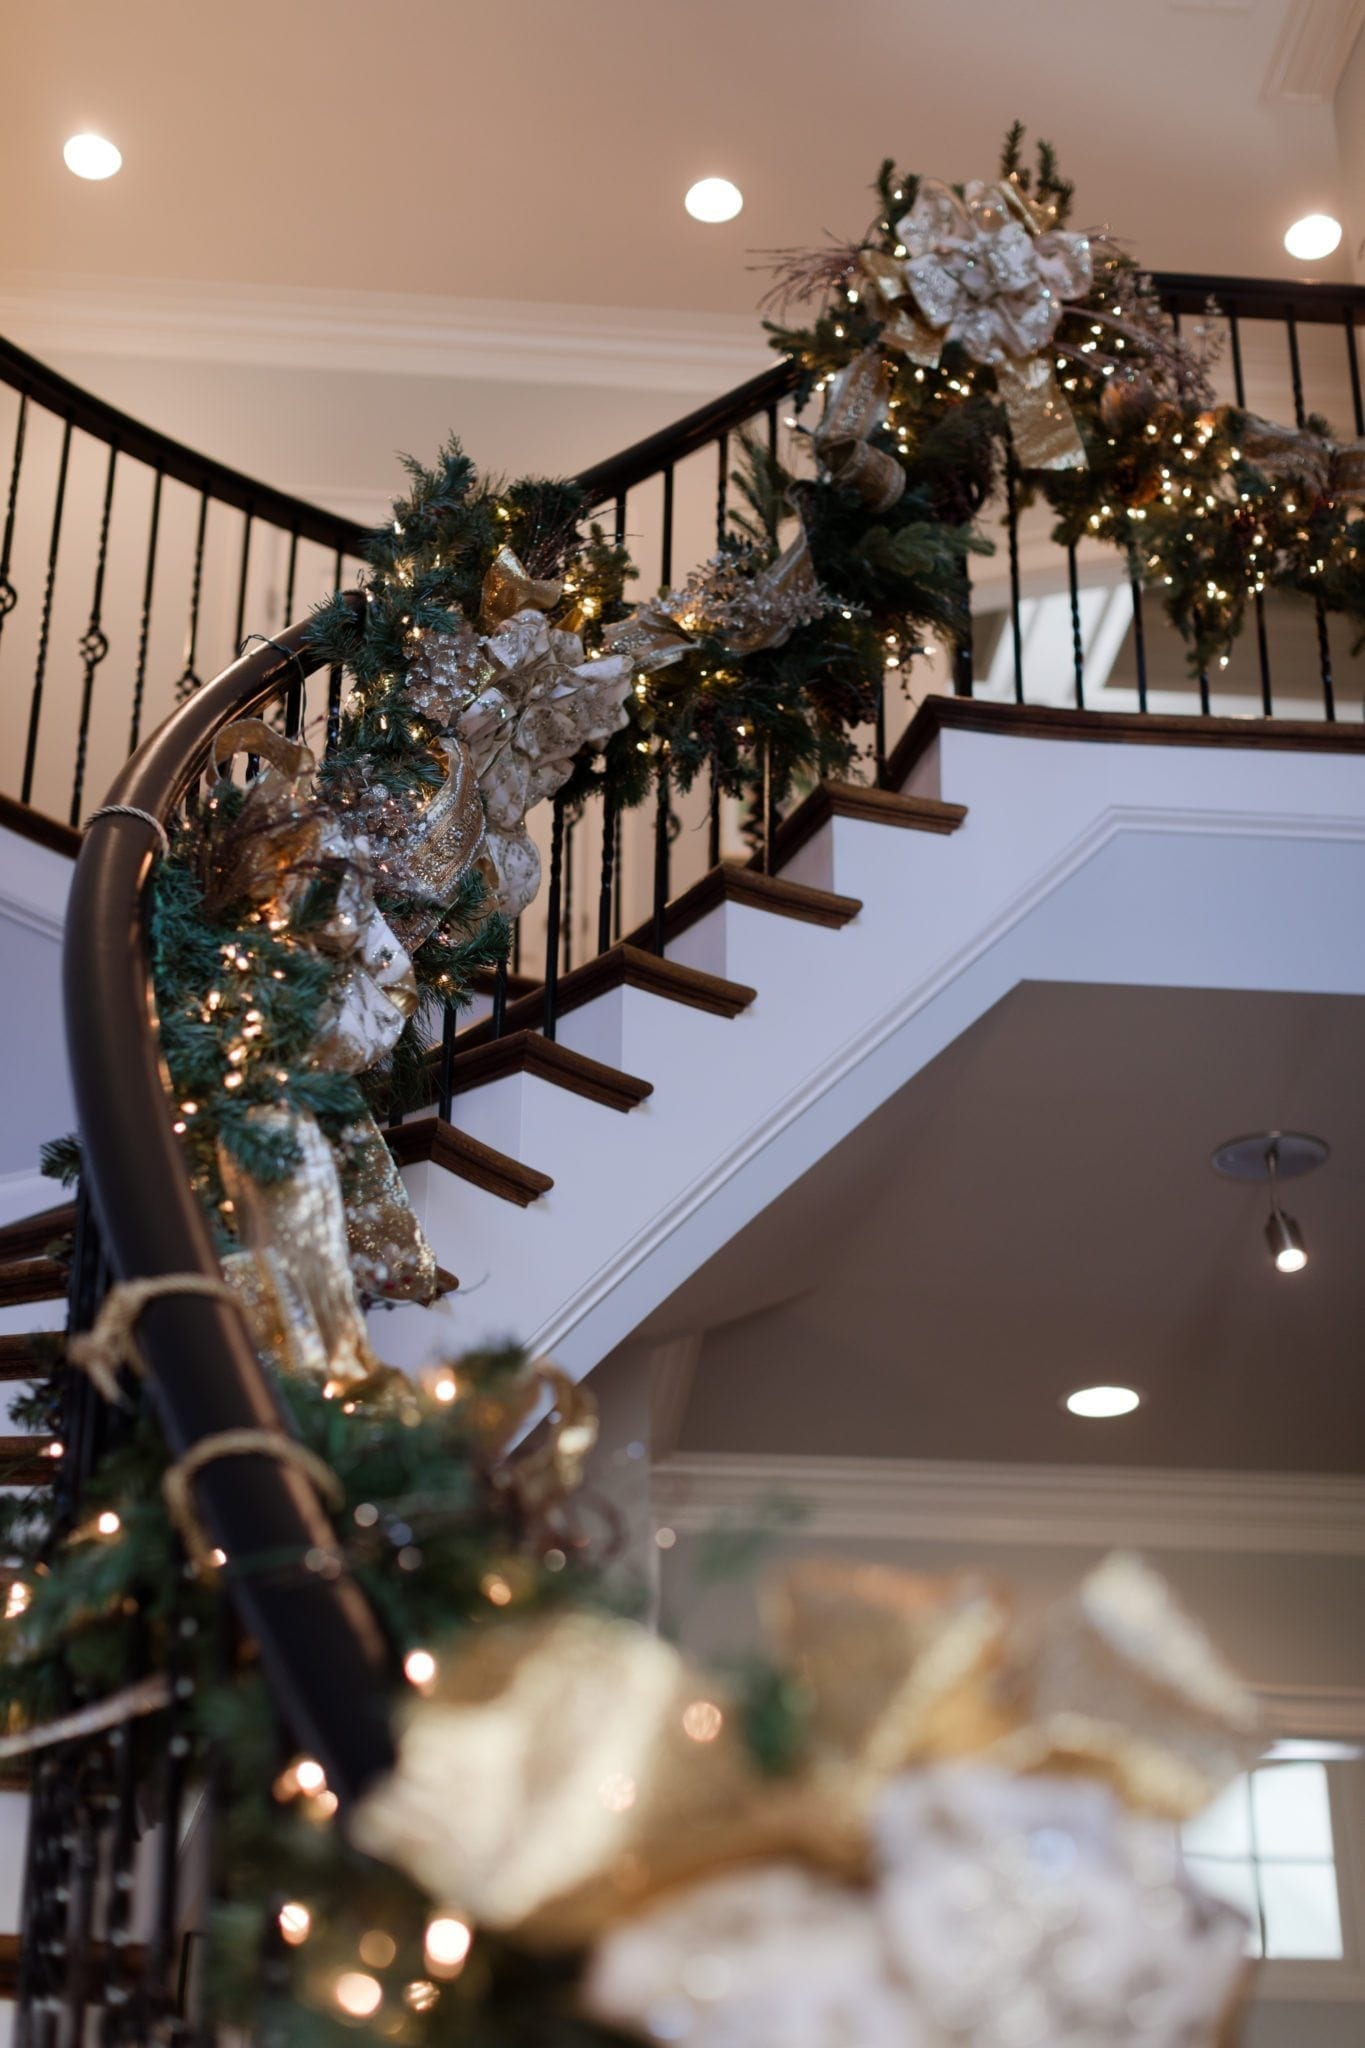 Christmas decoration ideas pinterest worthy. Full tour of Christmas decorating ideas.